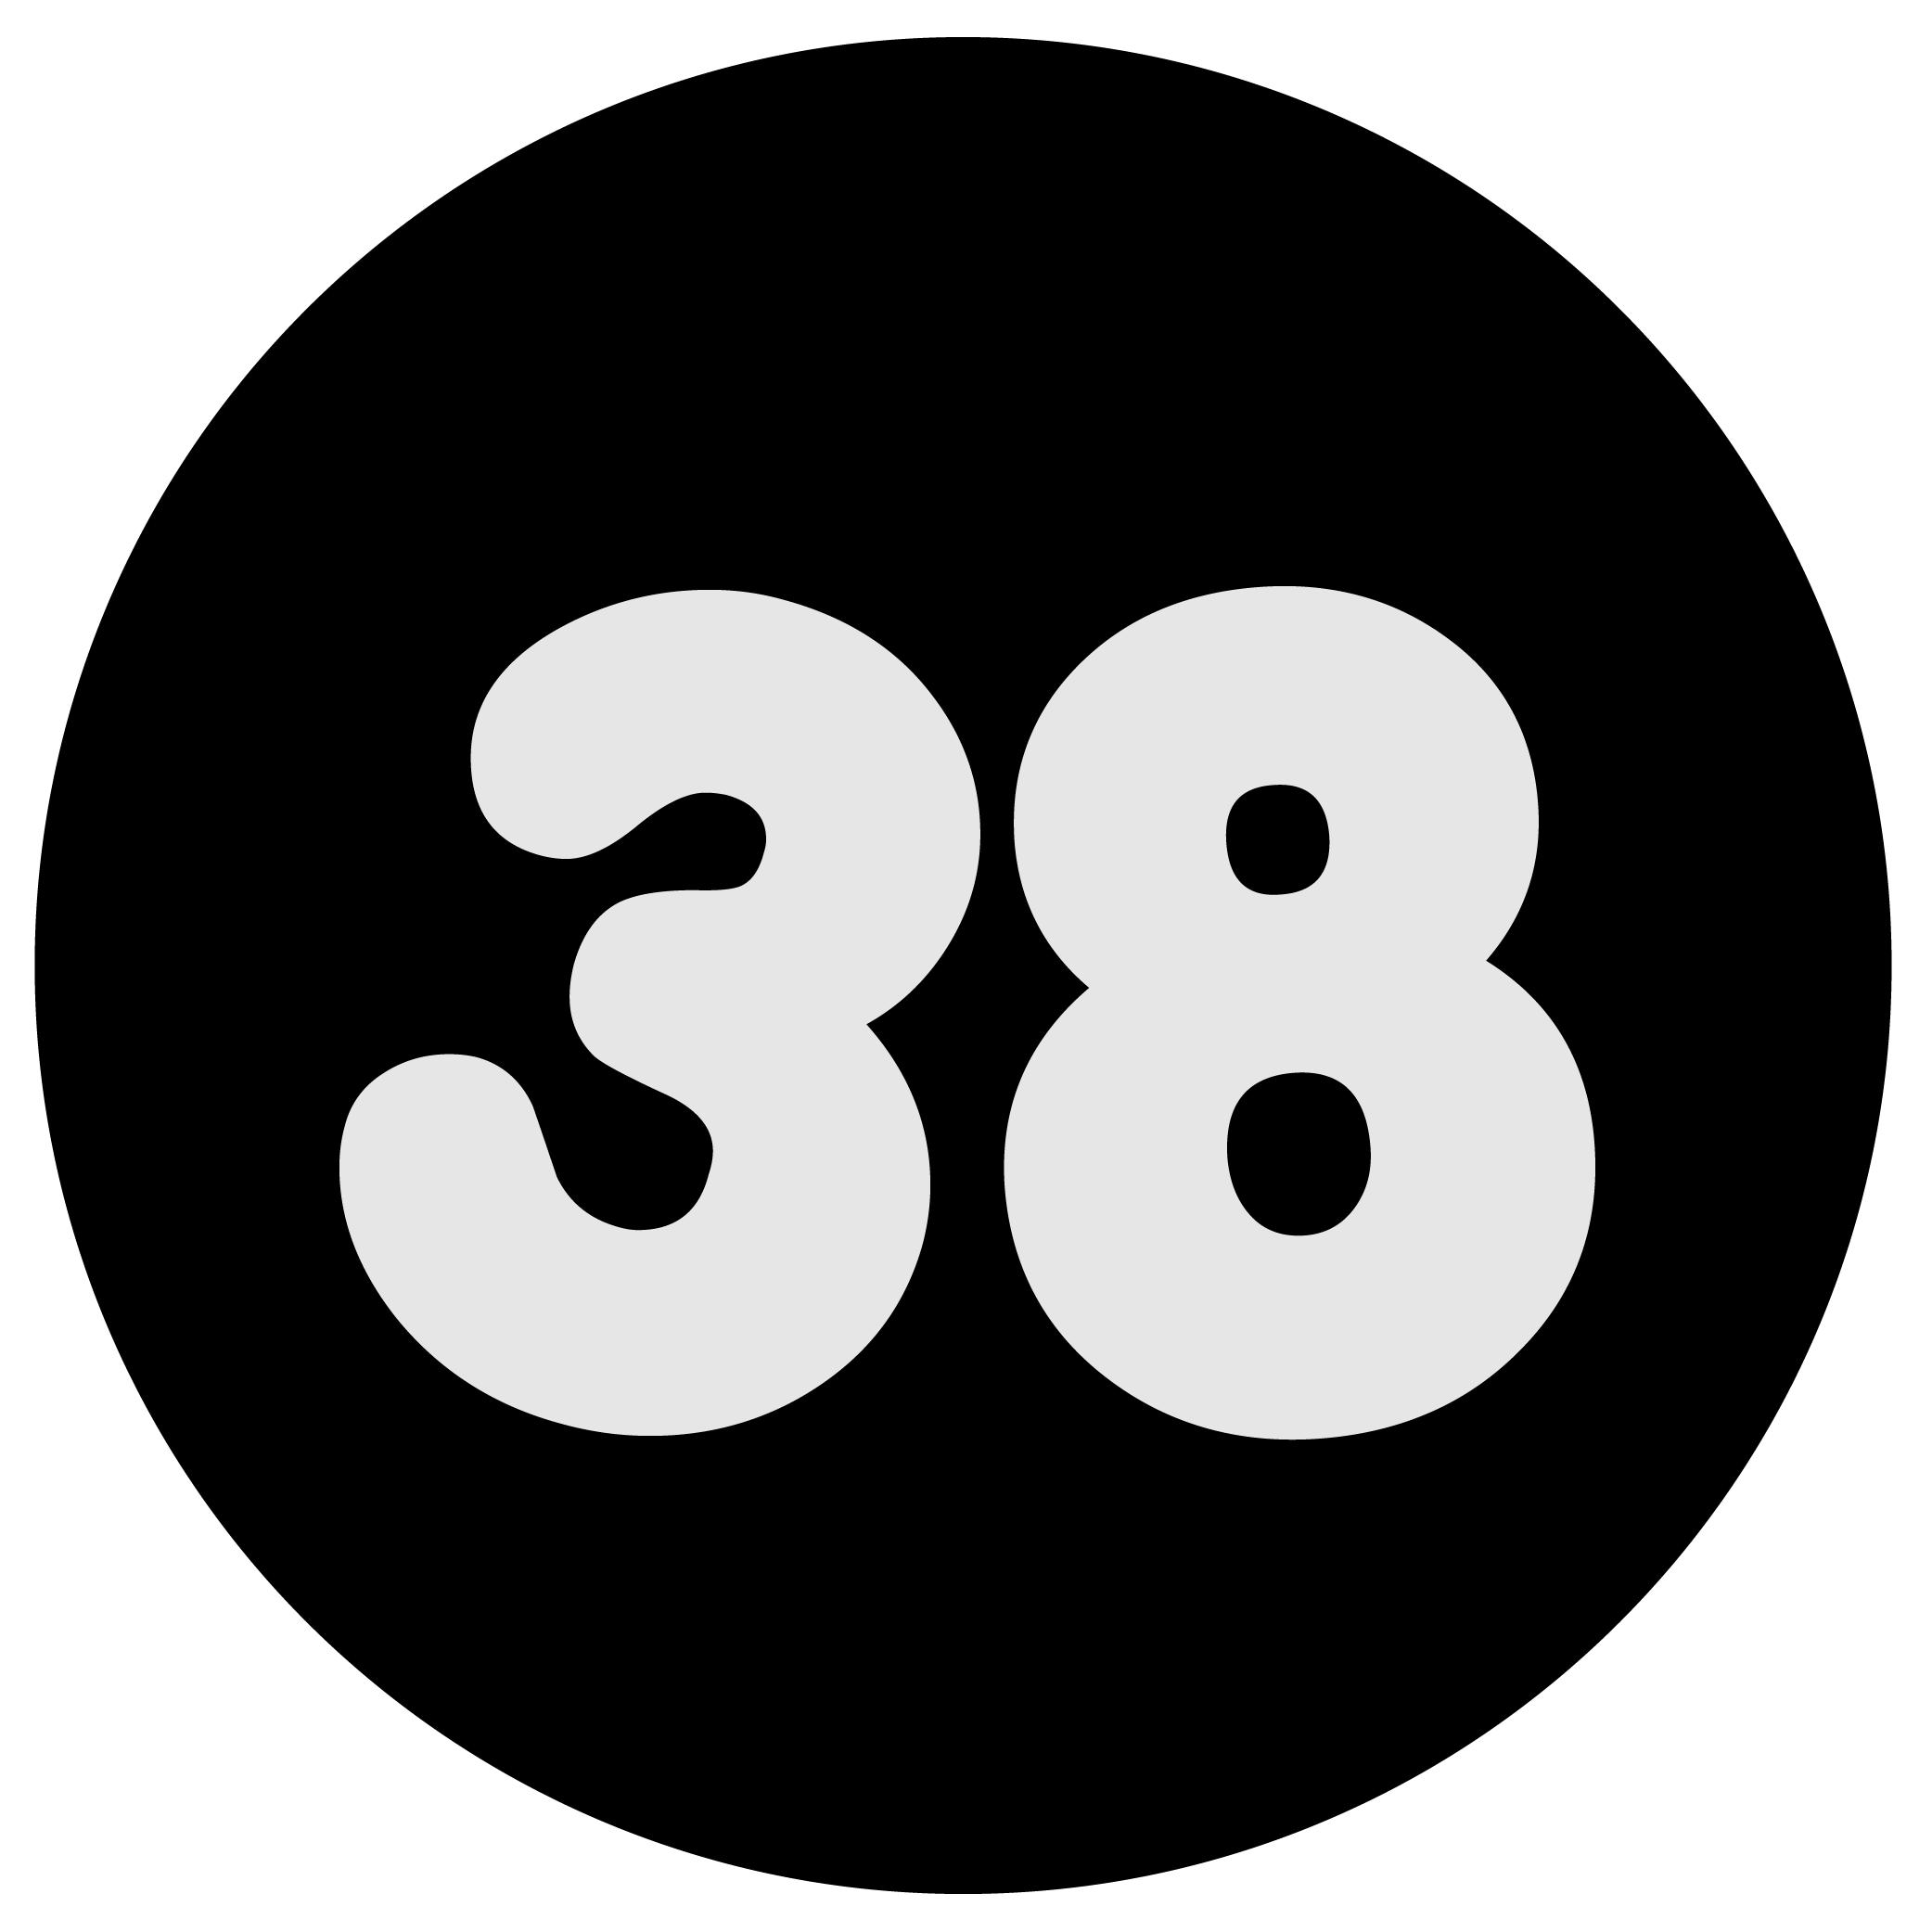 circles1png-27.png